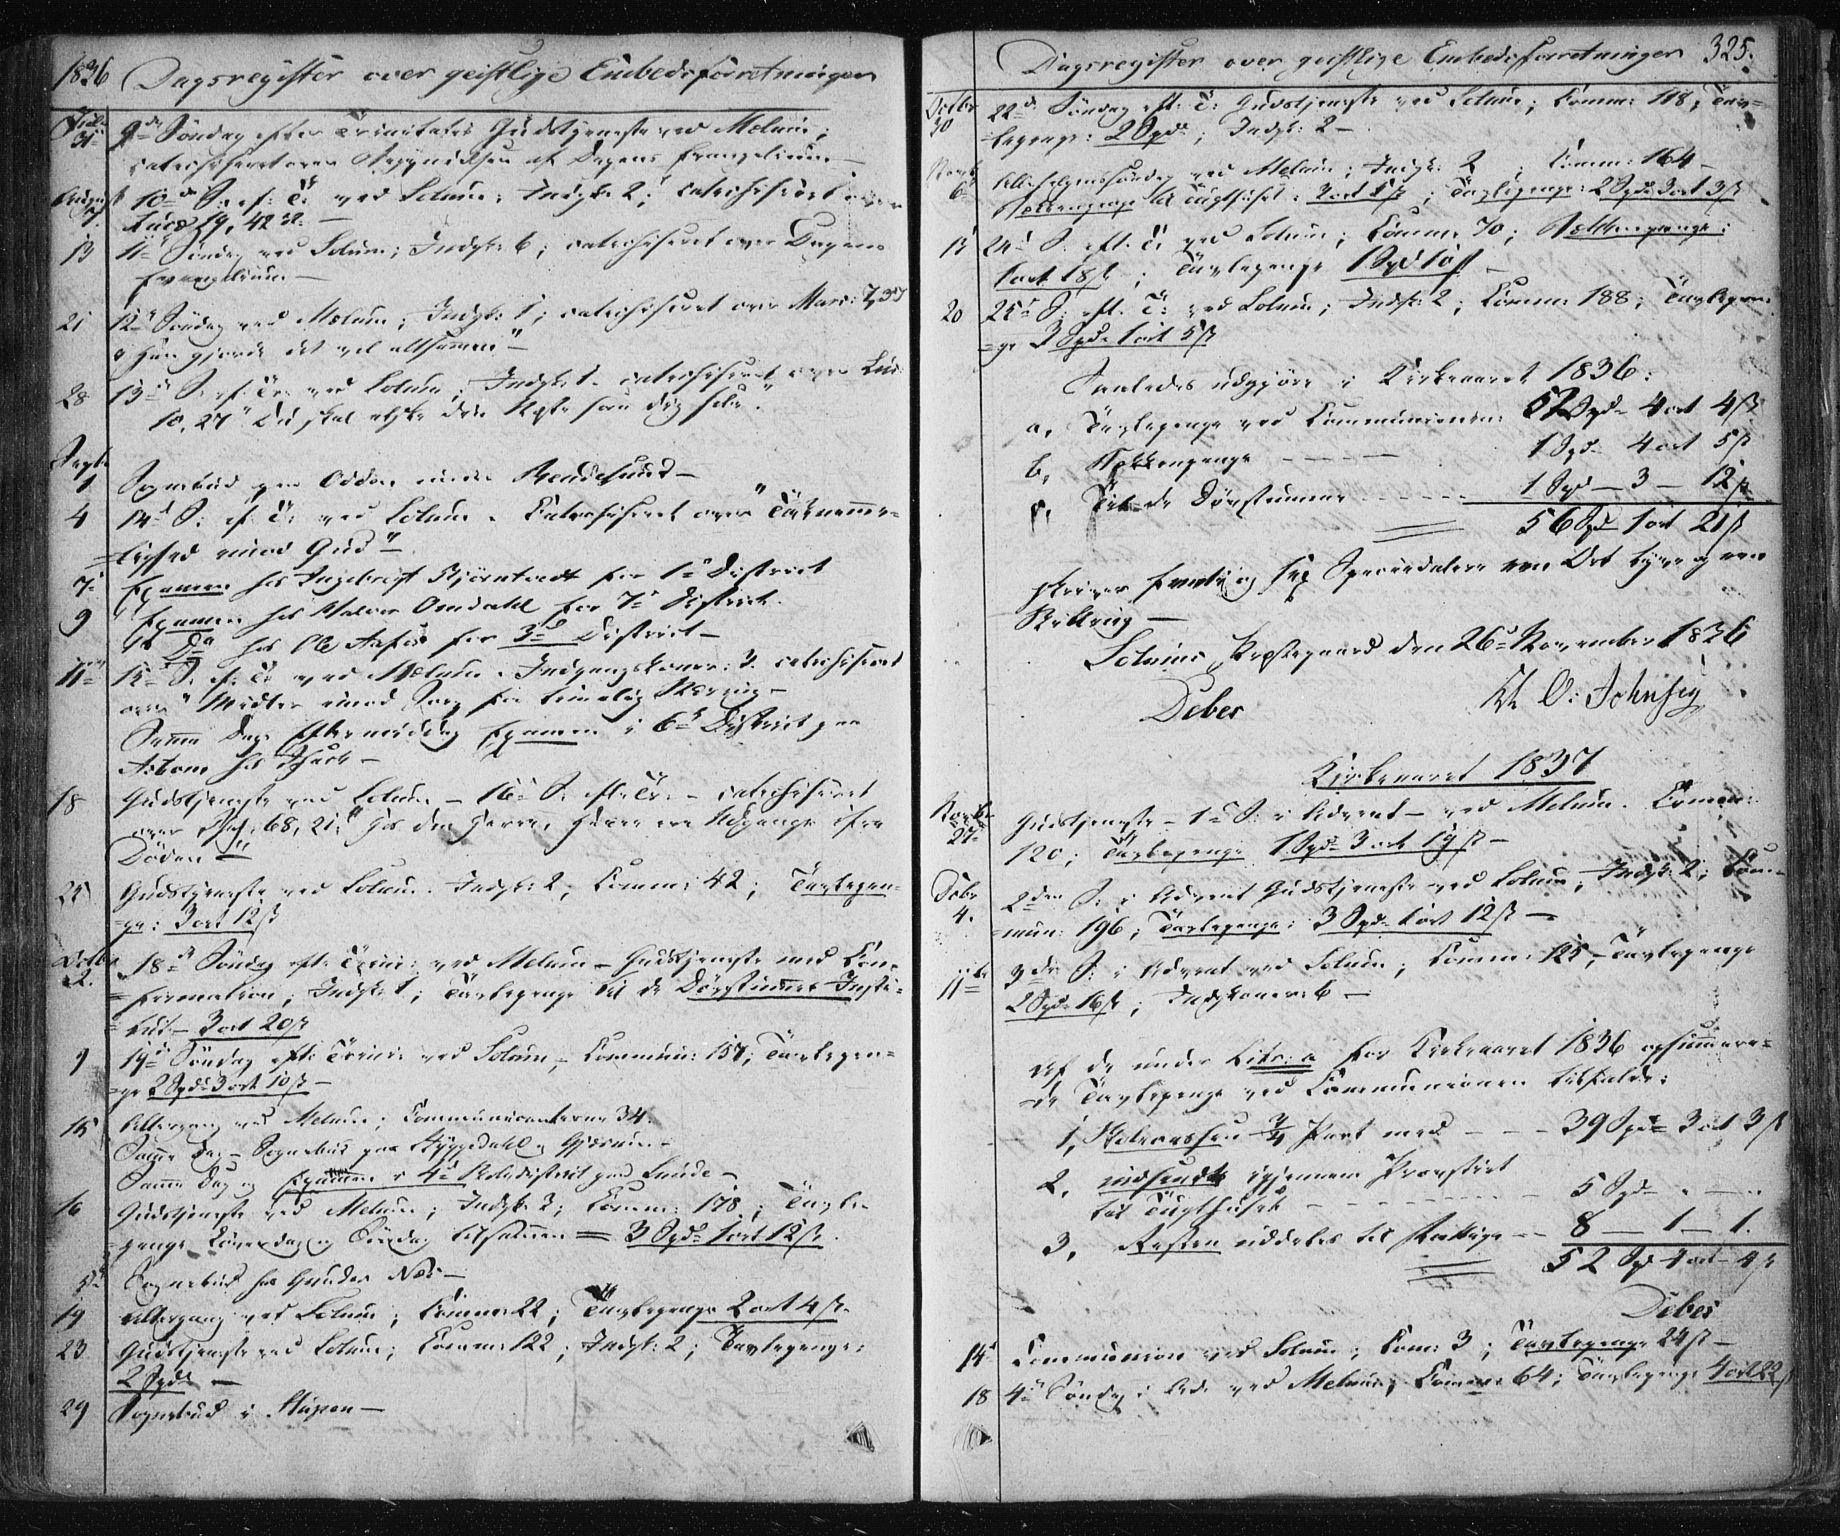 SAKO, Solum kirkebøker, F/Fa/L0005: Ministerialbok nr. I 5, 1833-1843, s. 325